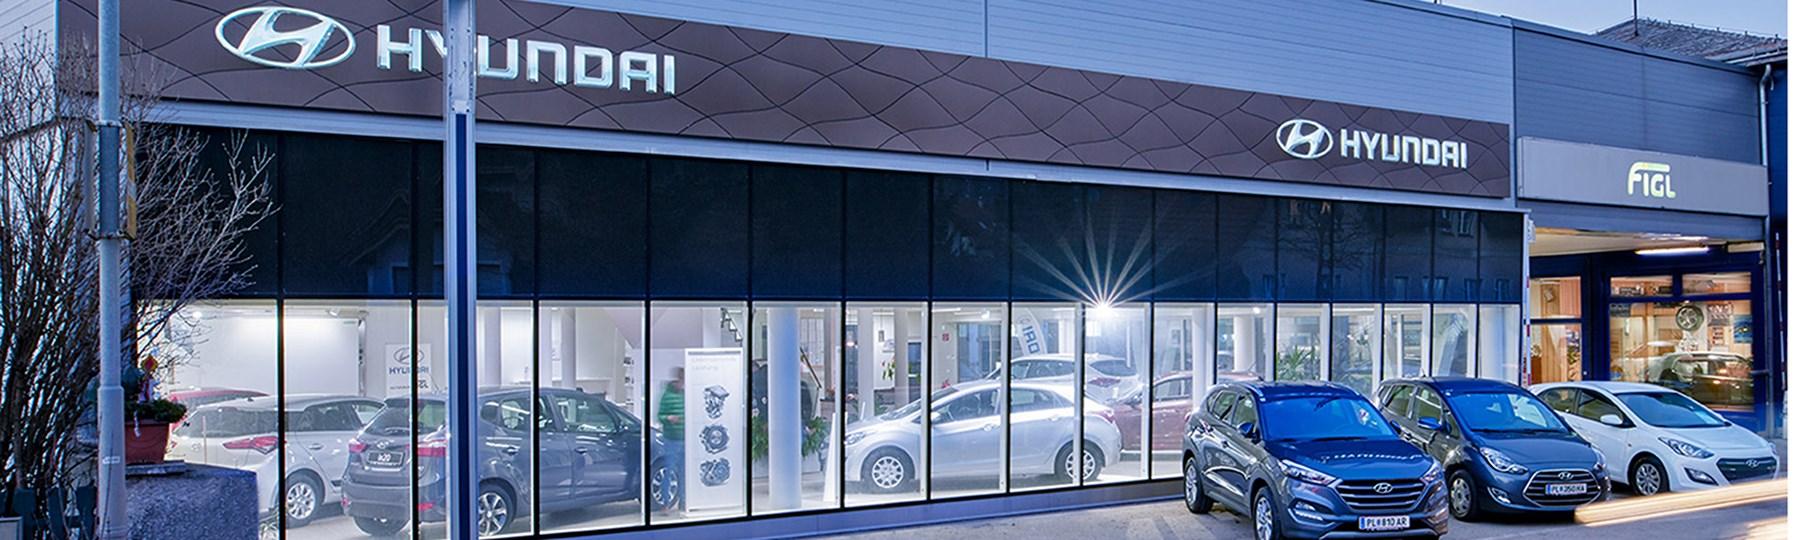 Autohaus Neulengbach Figl-Hyundai Aussenaufnahme-angepasst